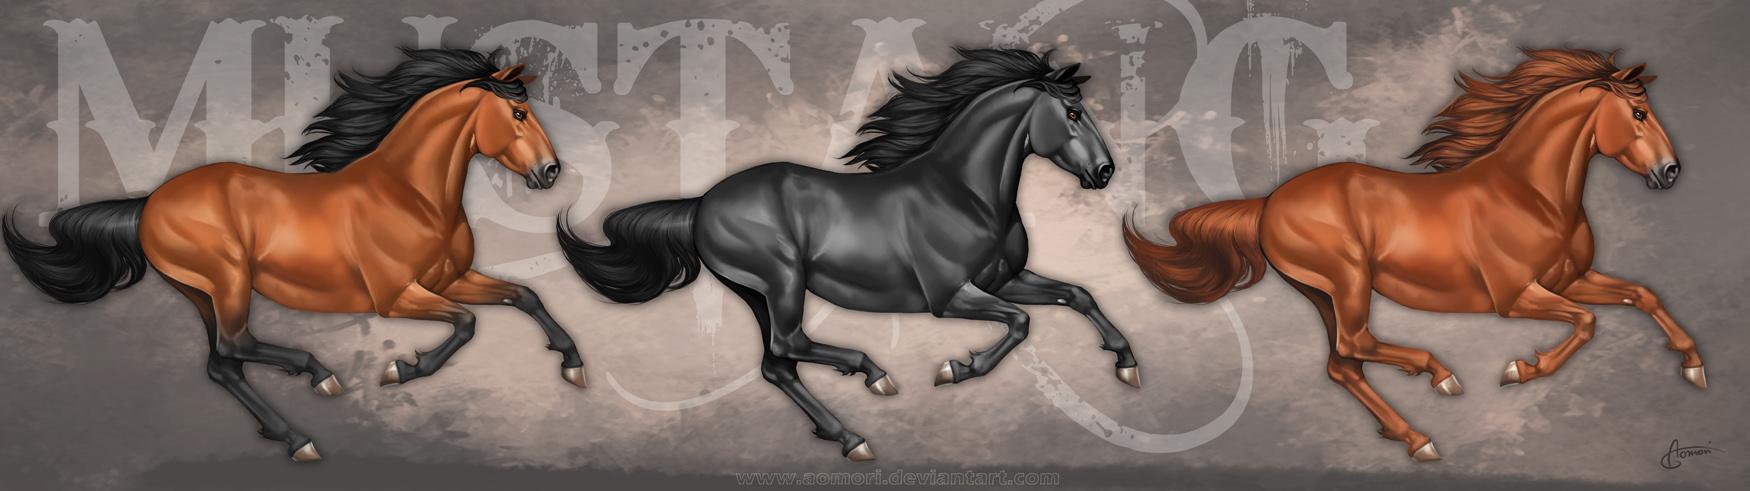 Mustang - final artwork by Aomori